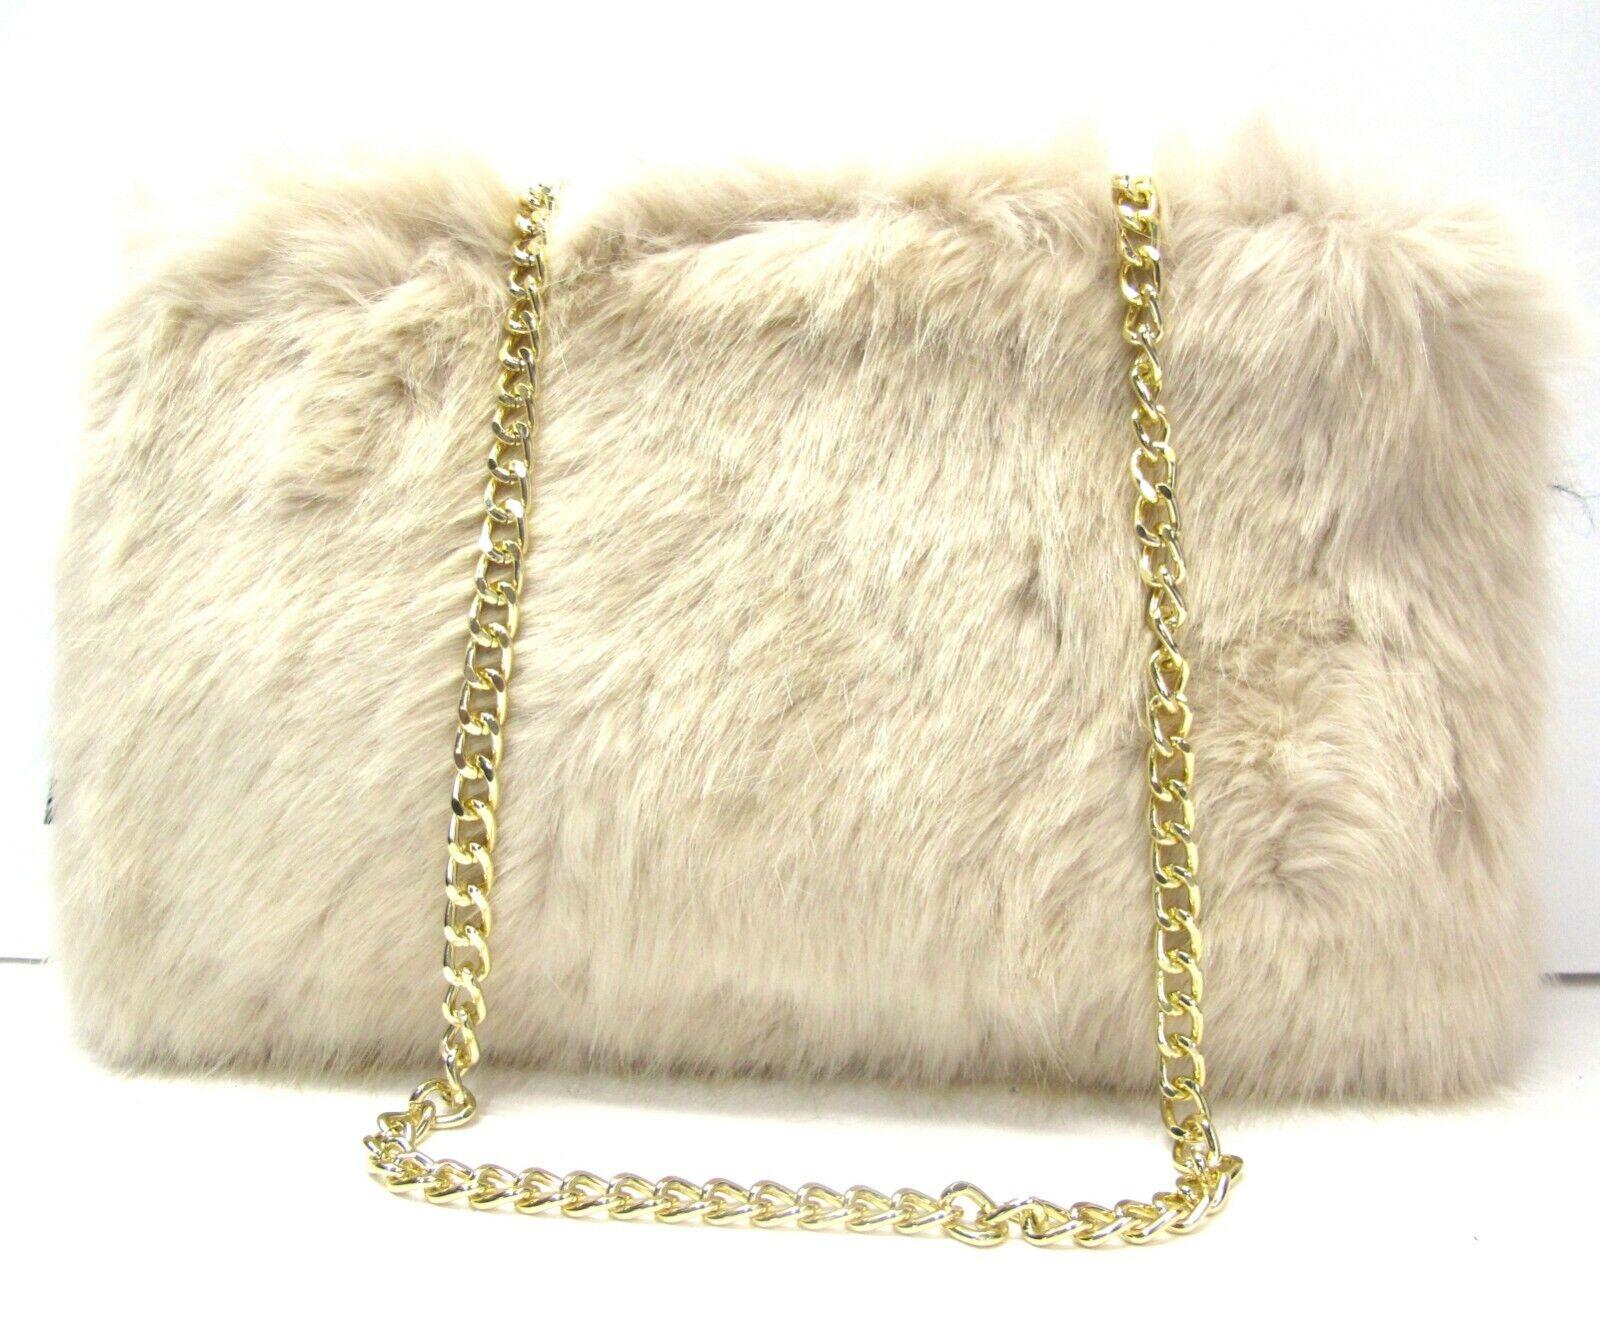 Women's Faux Fur Tote Bags Handbags & Purses for Women